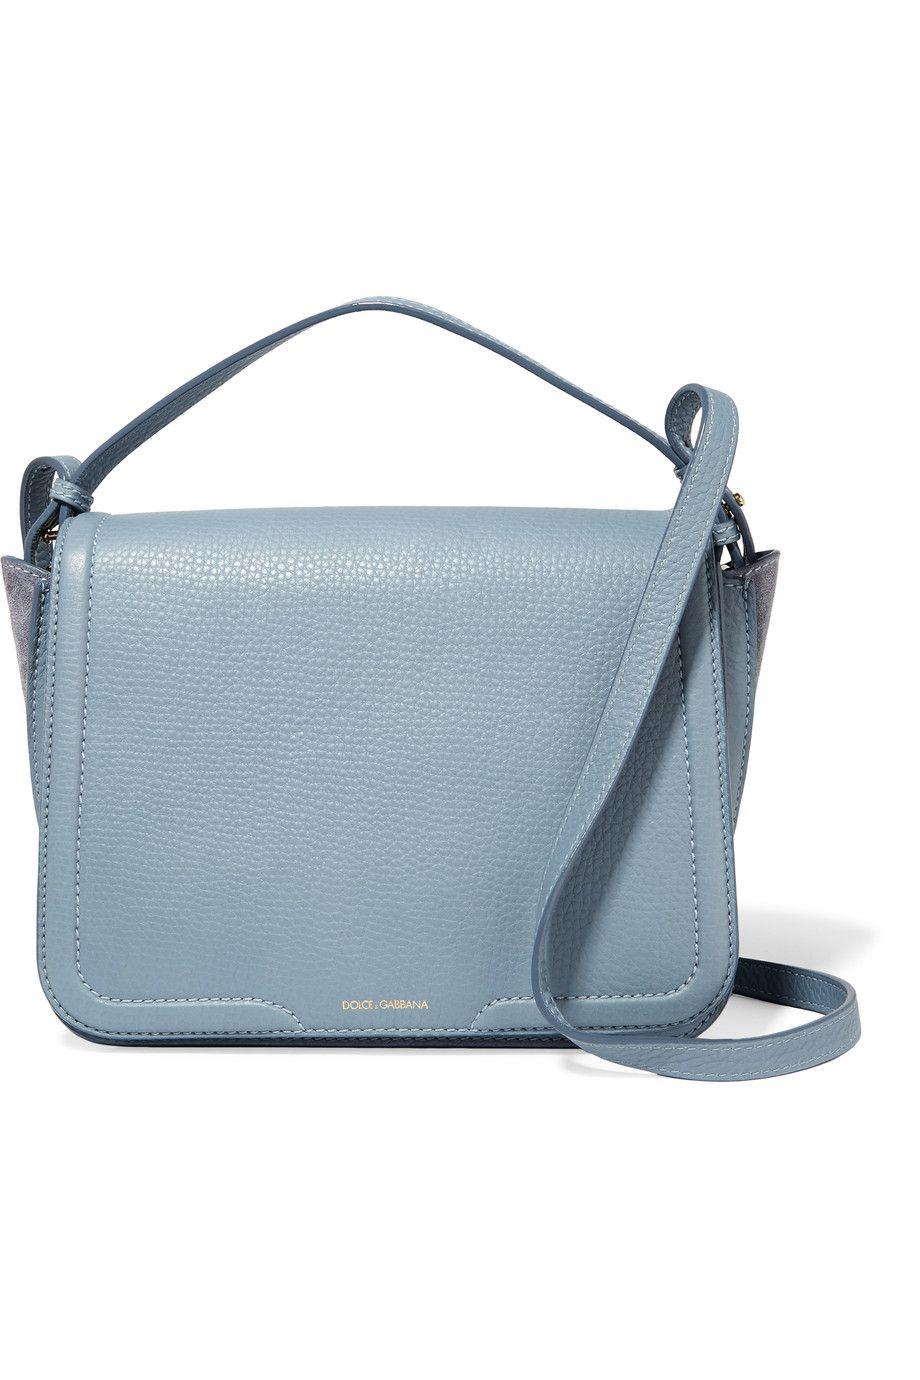 DOLCE   GABBANA Suede-Paneled Textured-Leather Shoulder Bag.  dolcegabbana   bags ea021f4028e93